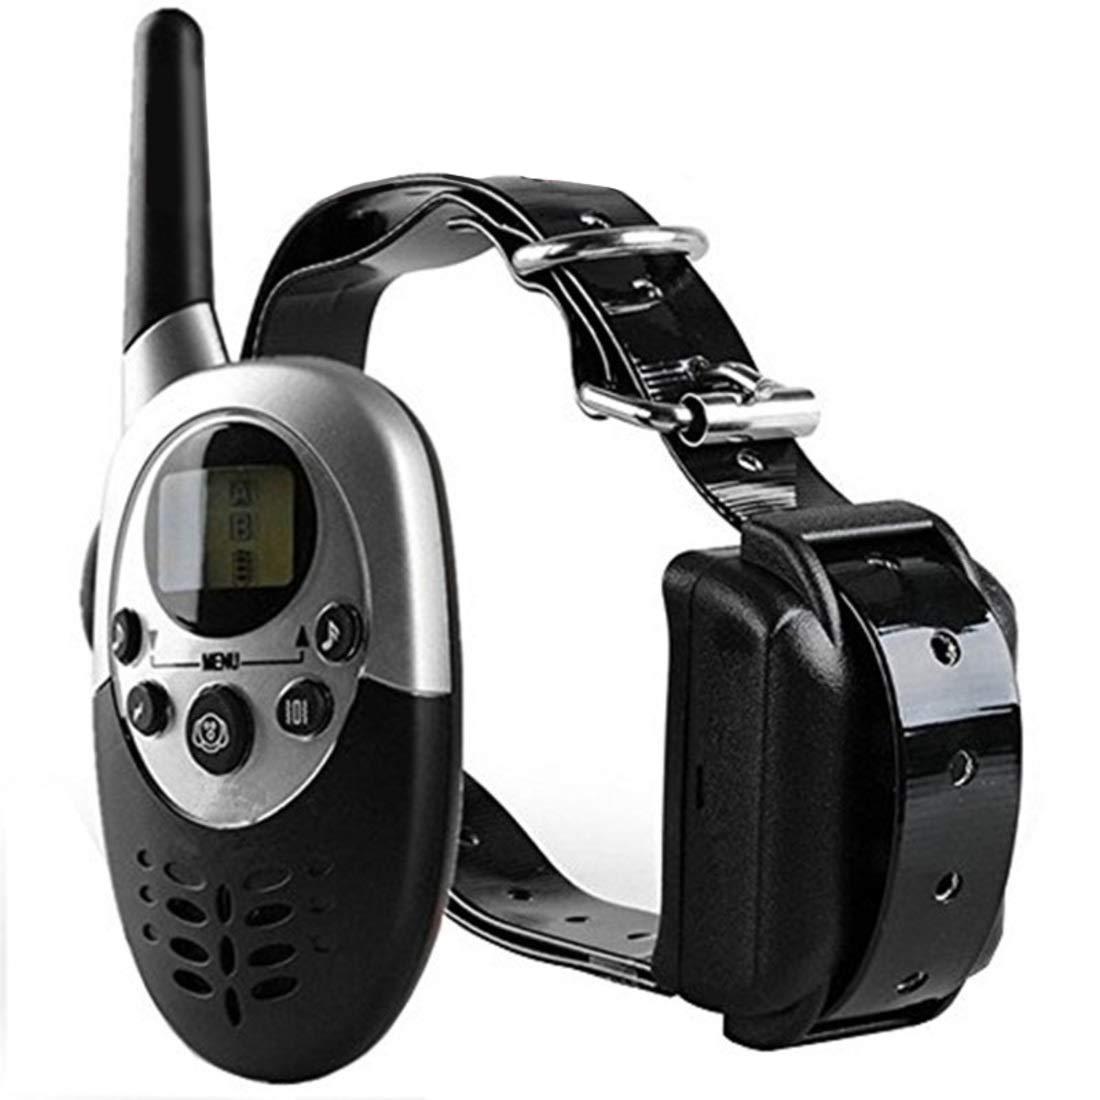 M86 BAOYIT Rainproof Dog Shock Collar with Remote Dog Training Collar, Training Device Every Dog Owner (Size   M86)